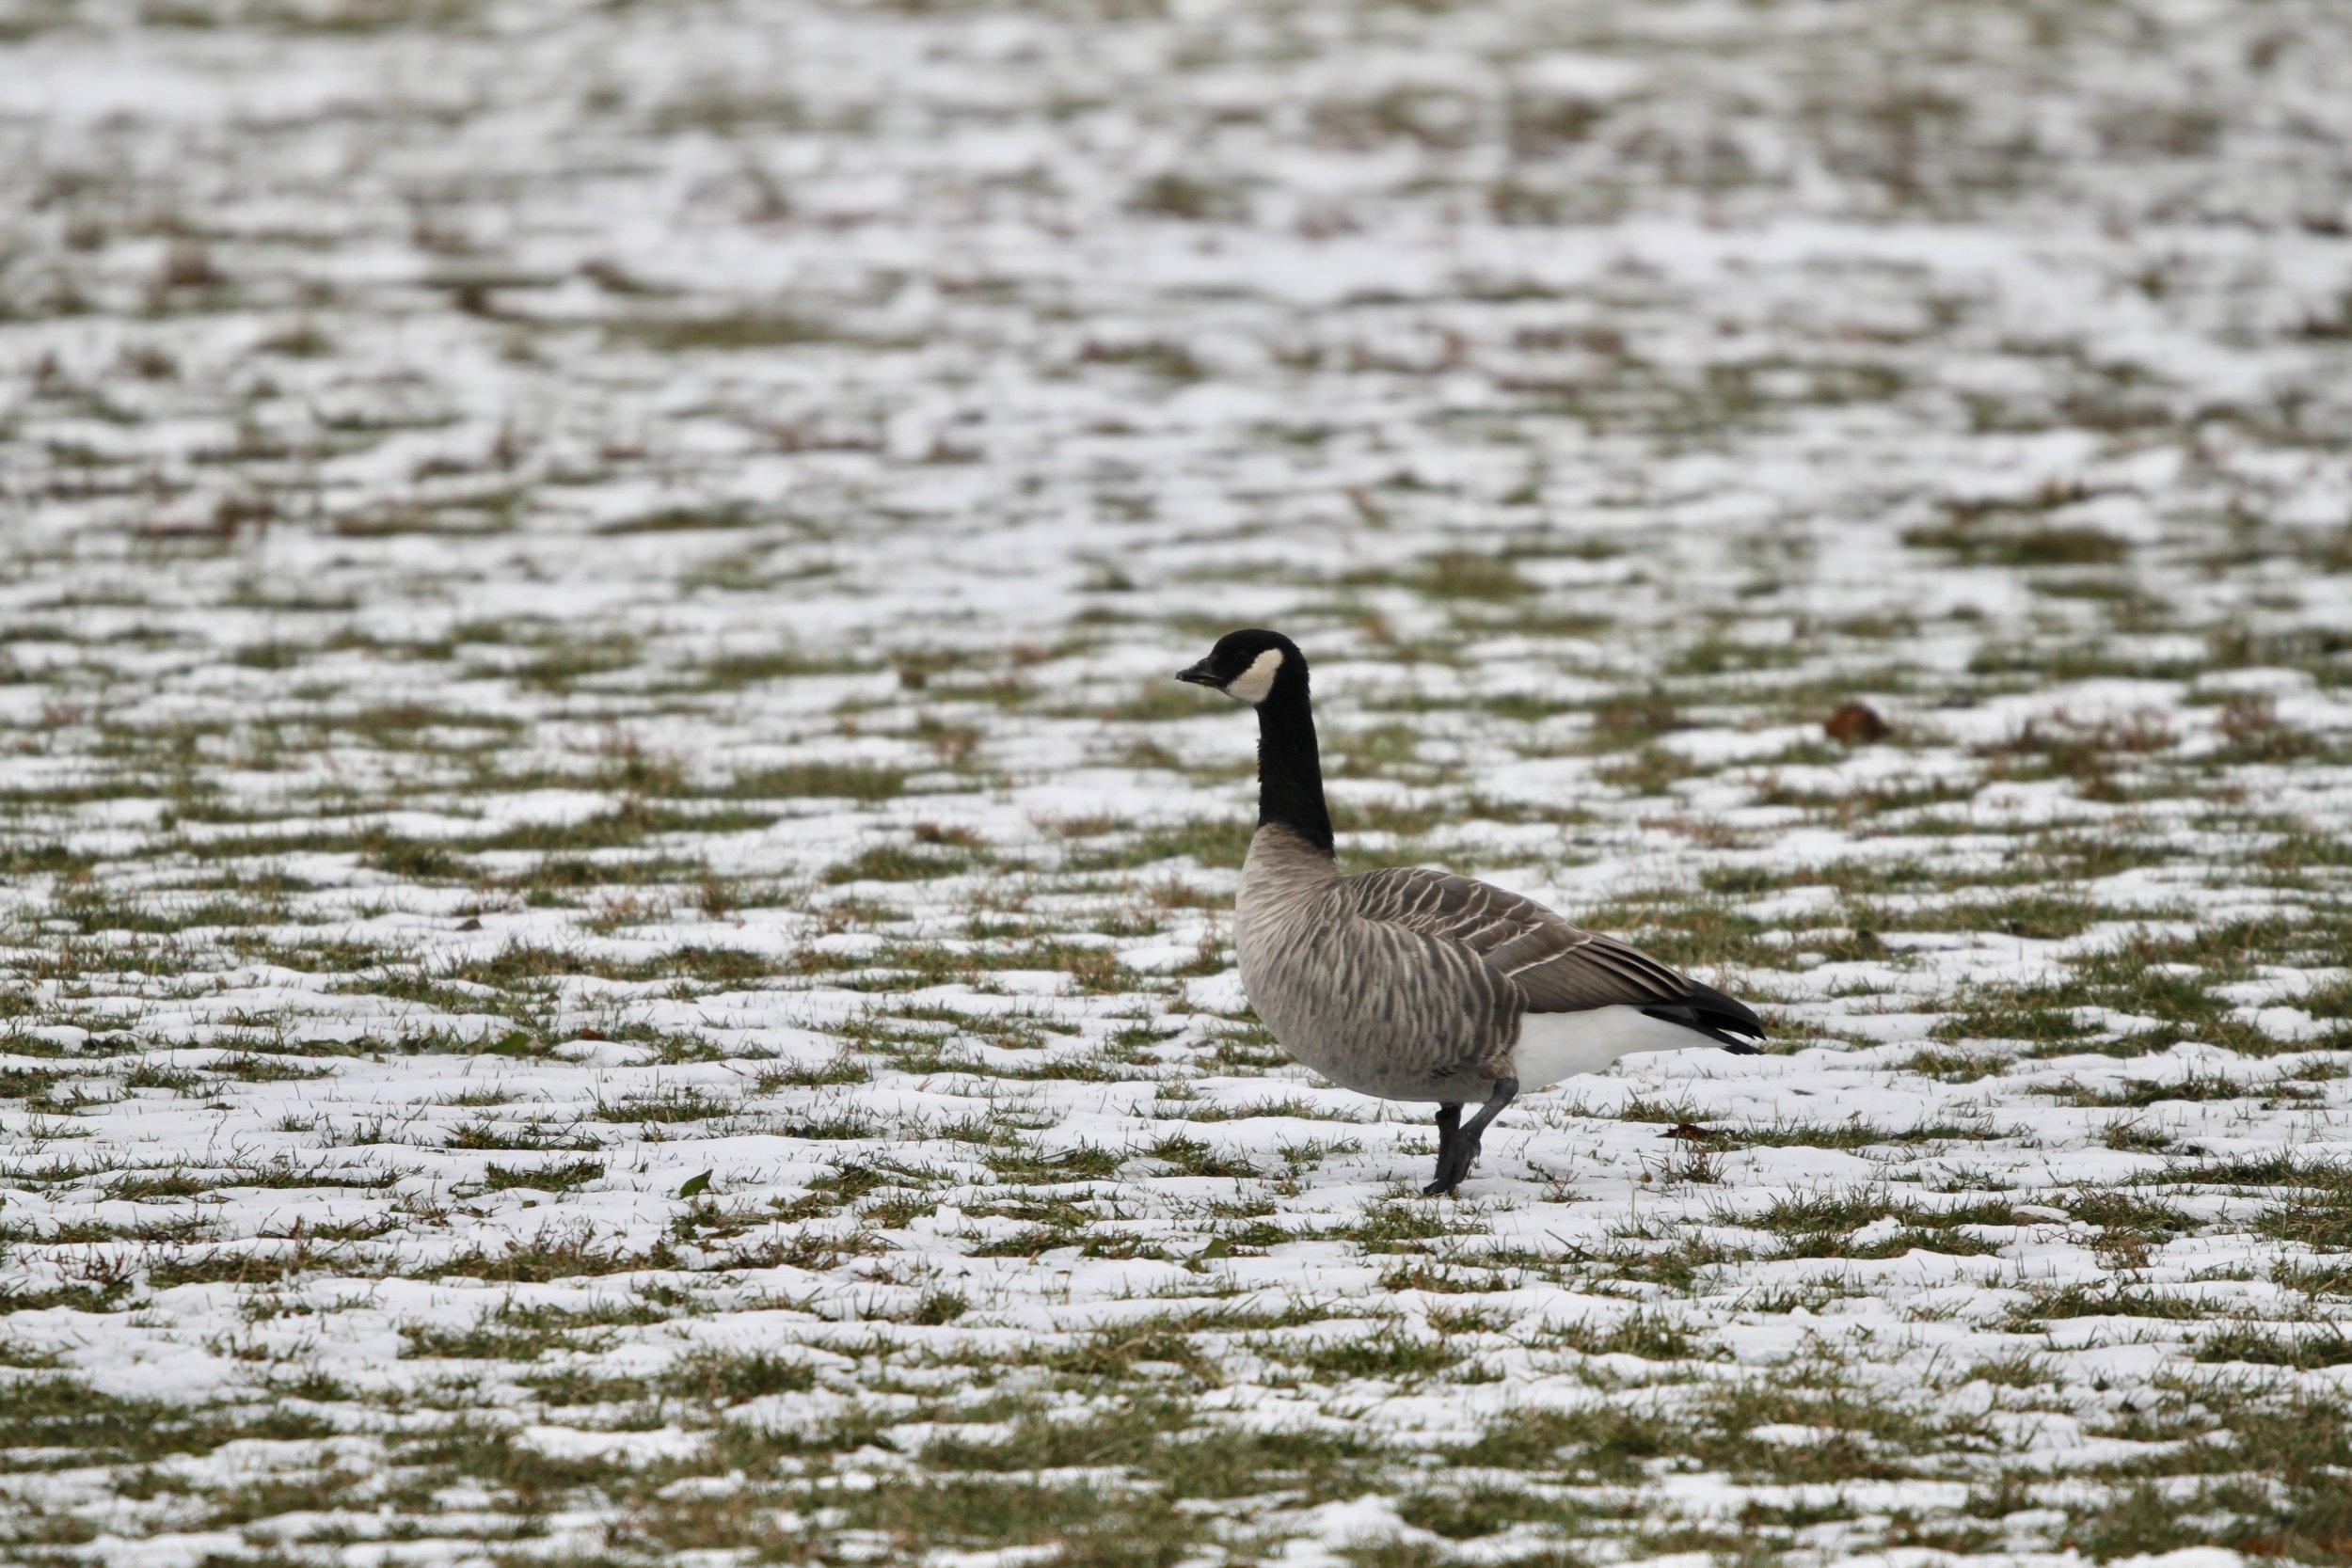 A Cackling Goose present in Calumet Park in Chicago in November 2018.